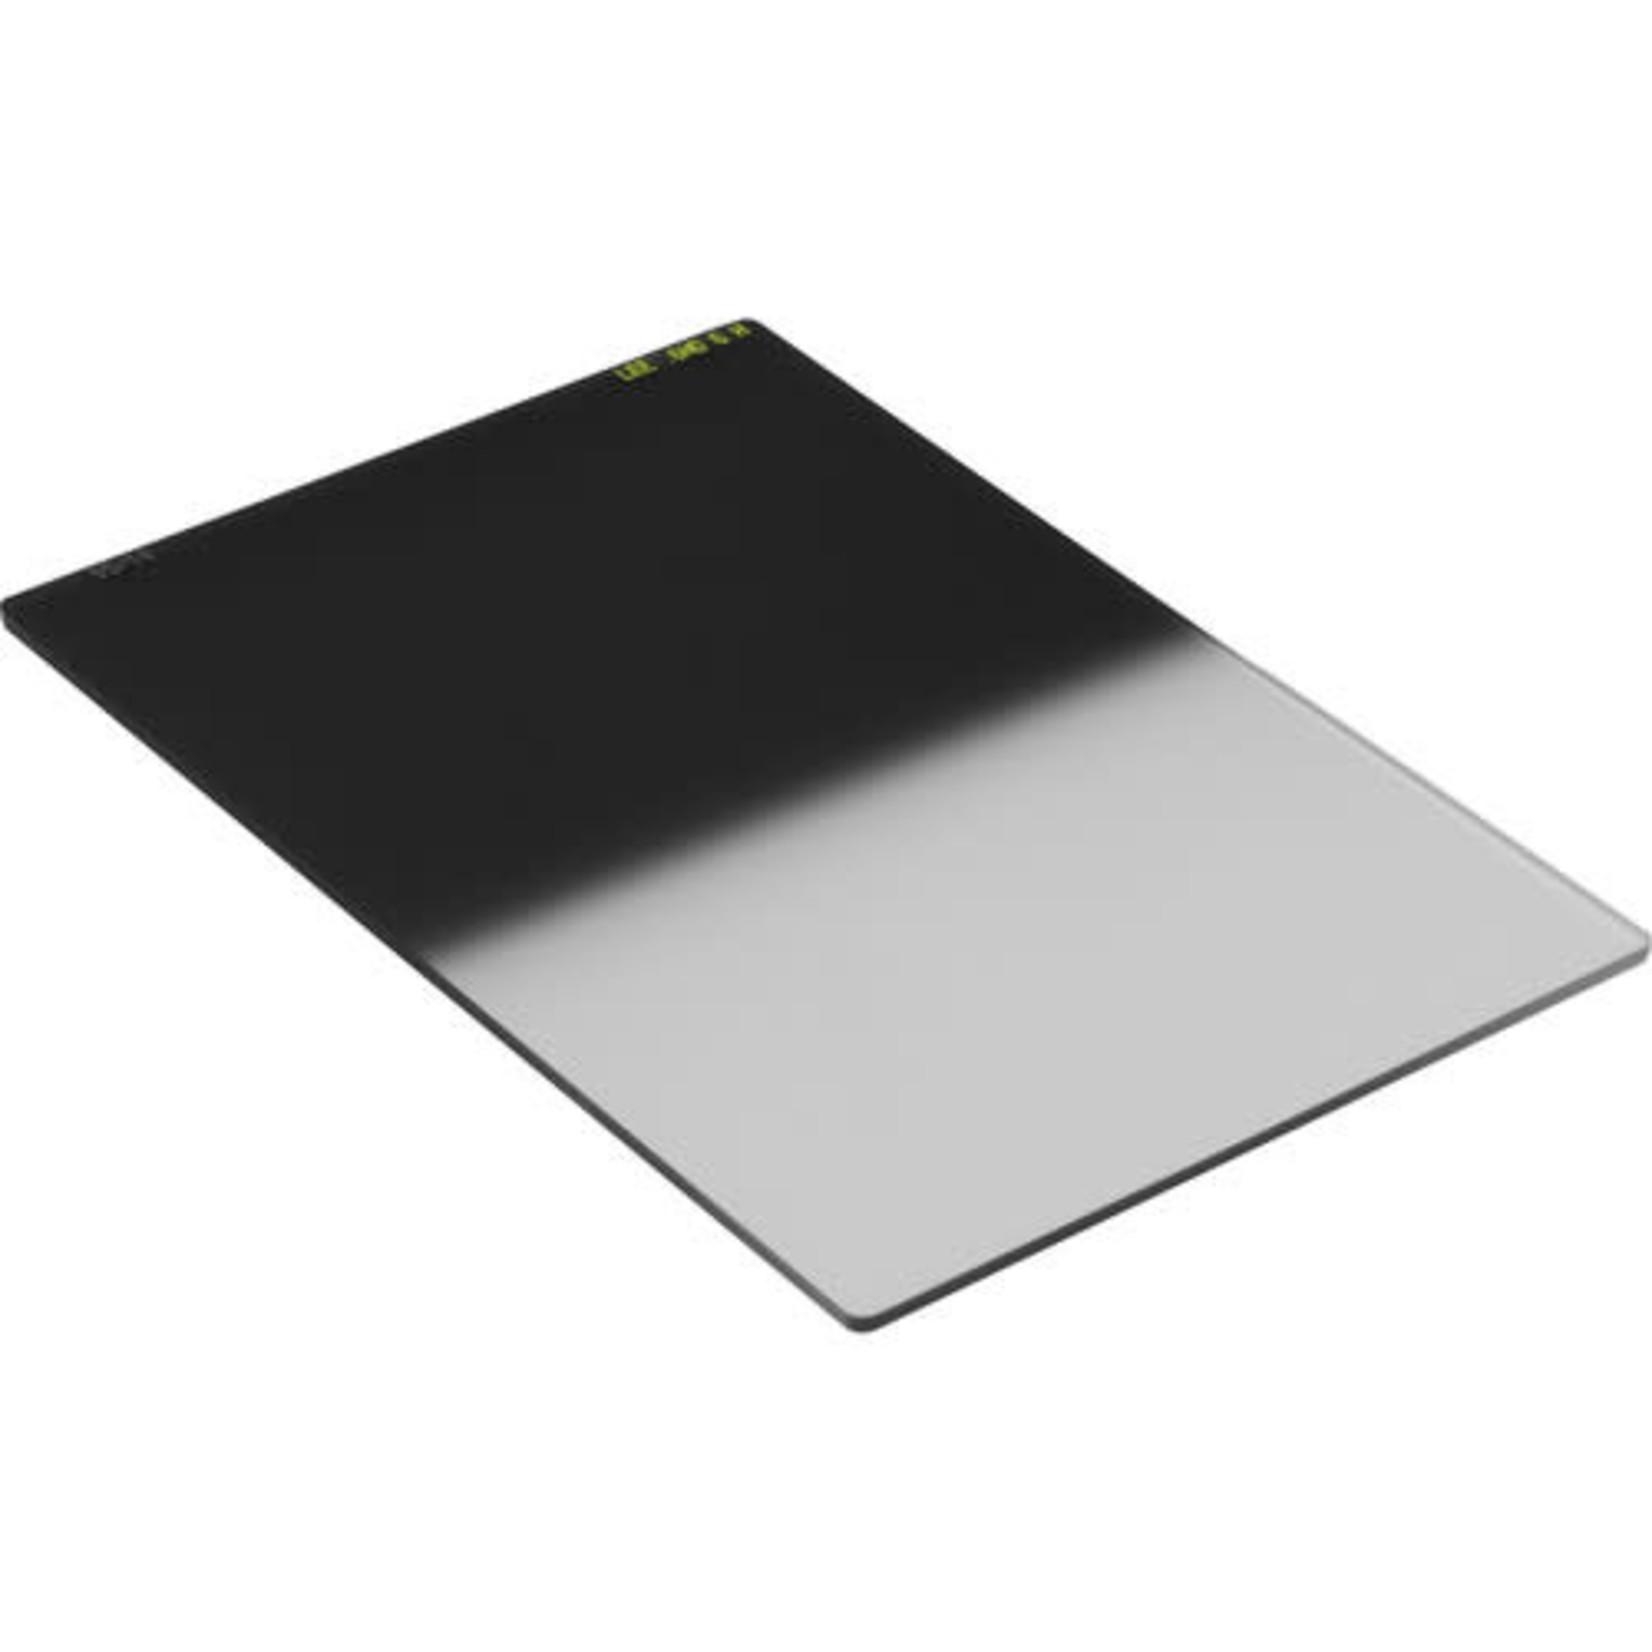 Lee LEE Filters 100 x 150mm Hard Graduated Neutral Density 0.6 Filter